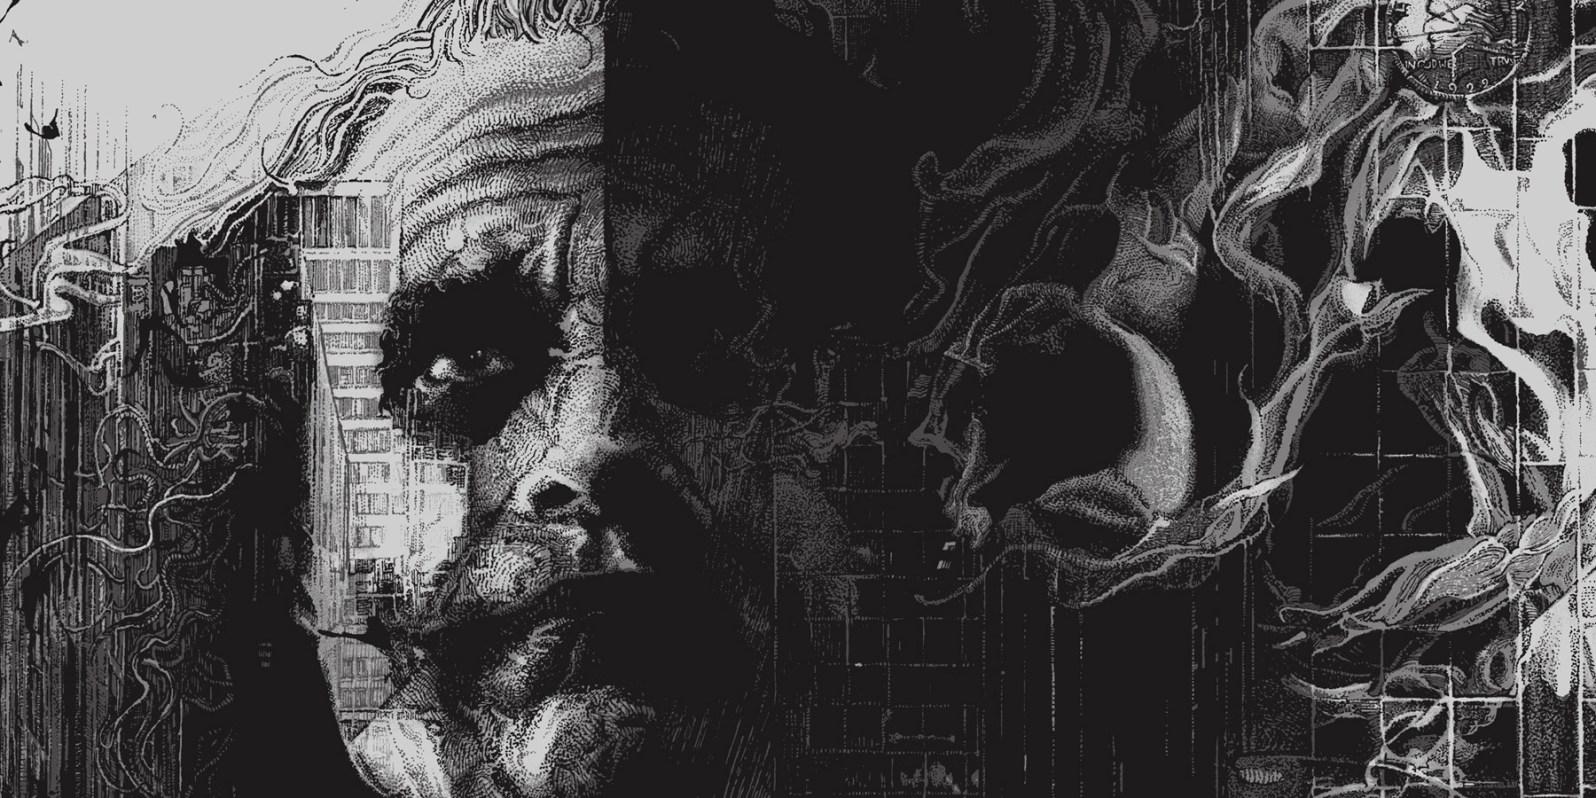 Quelle: studiokxx.com - Krzysztof Domaradzki - The Dark Knight Detail